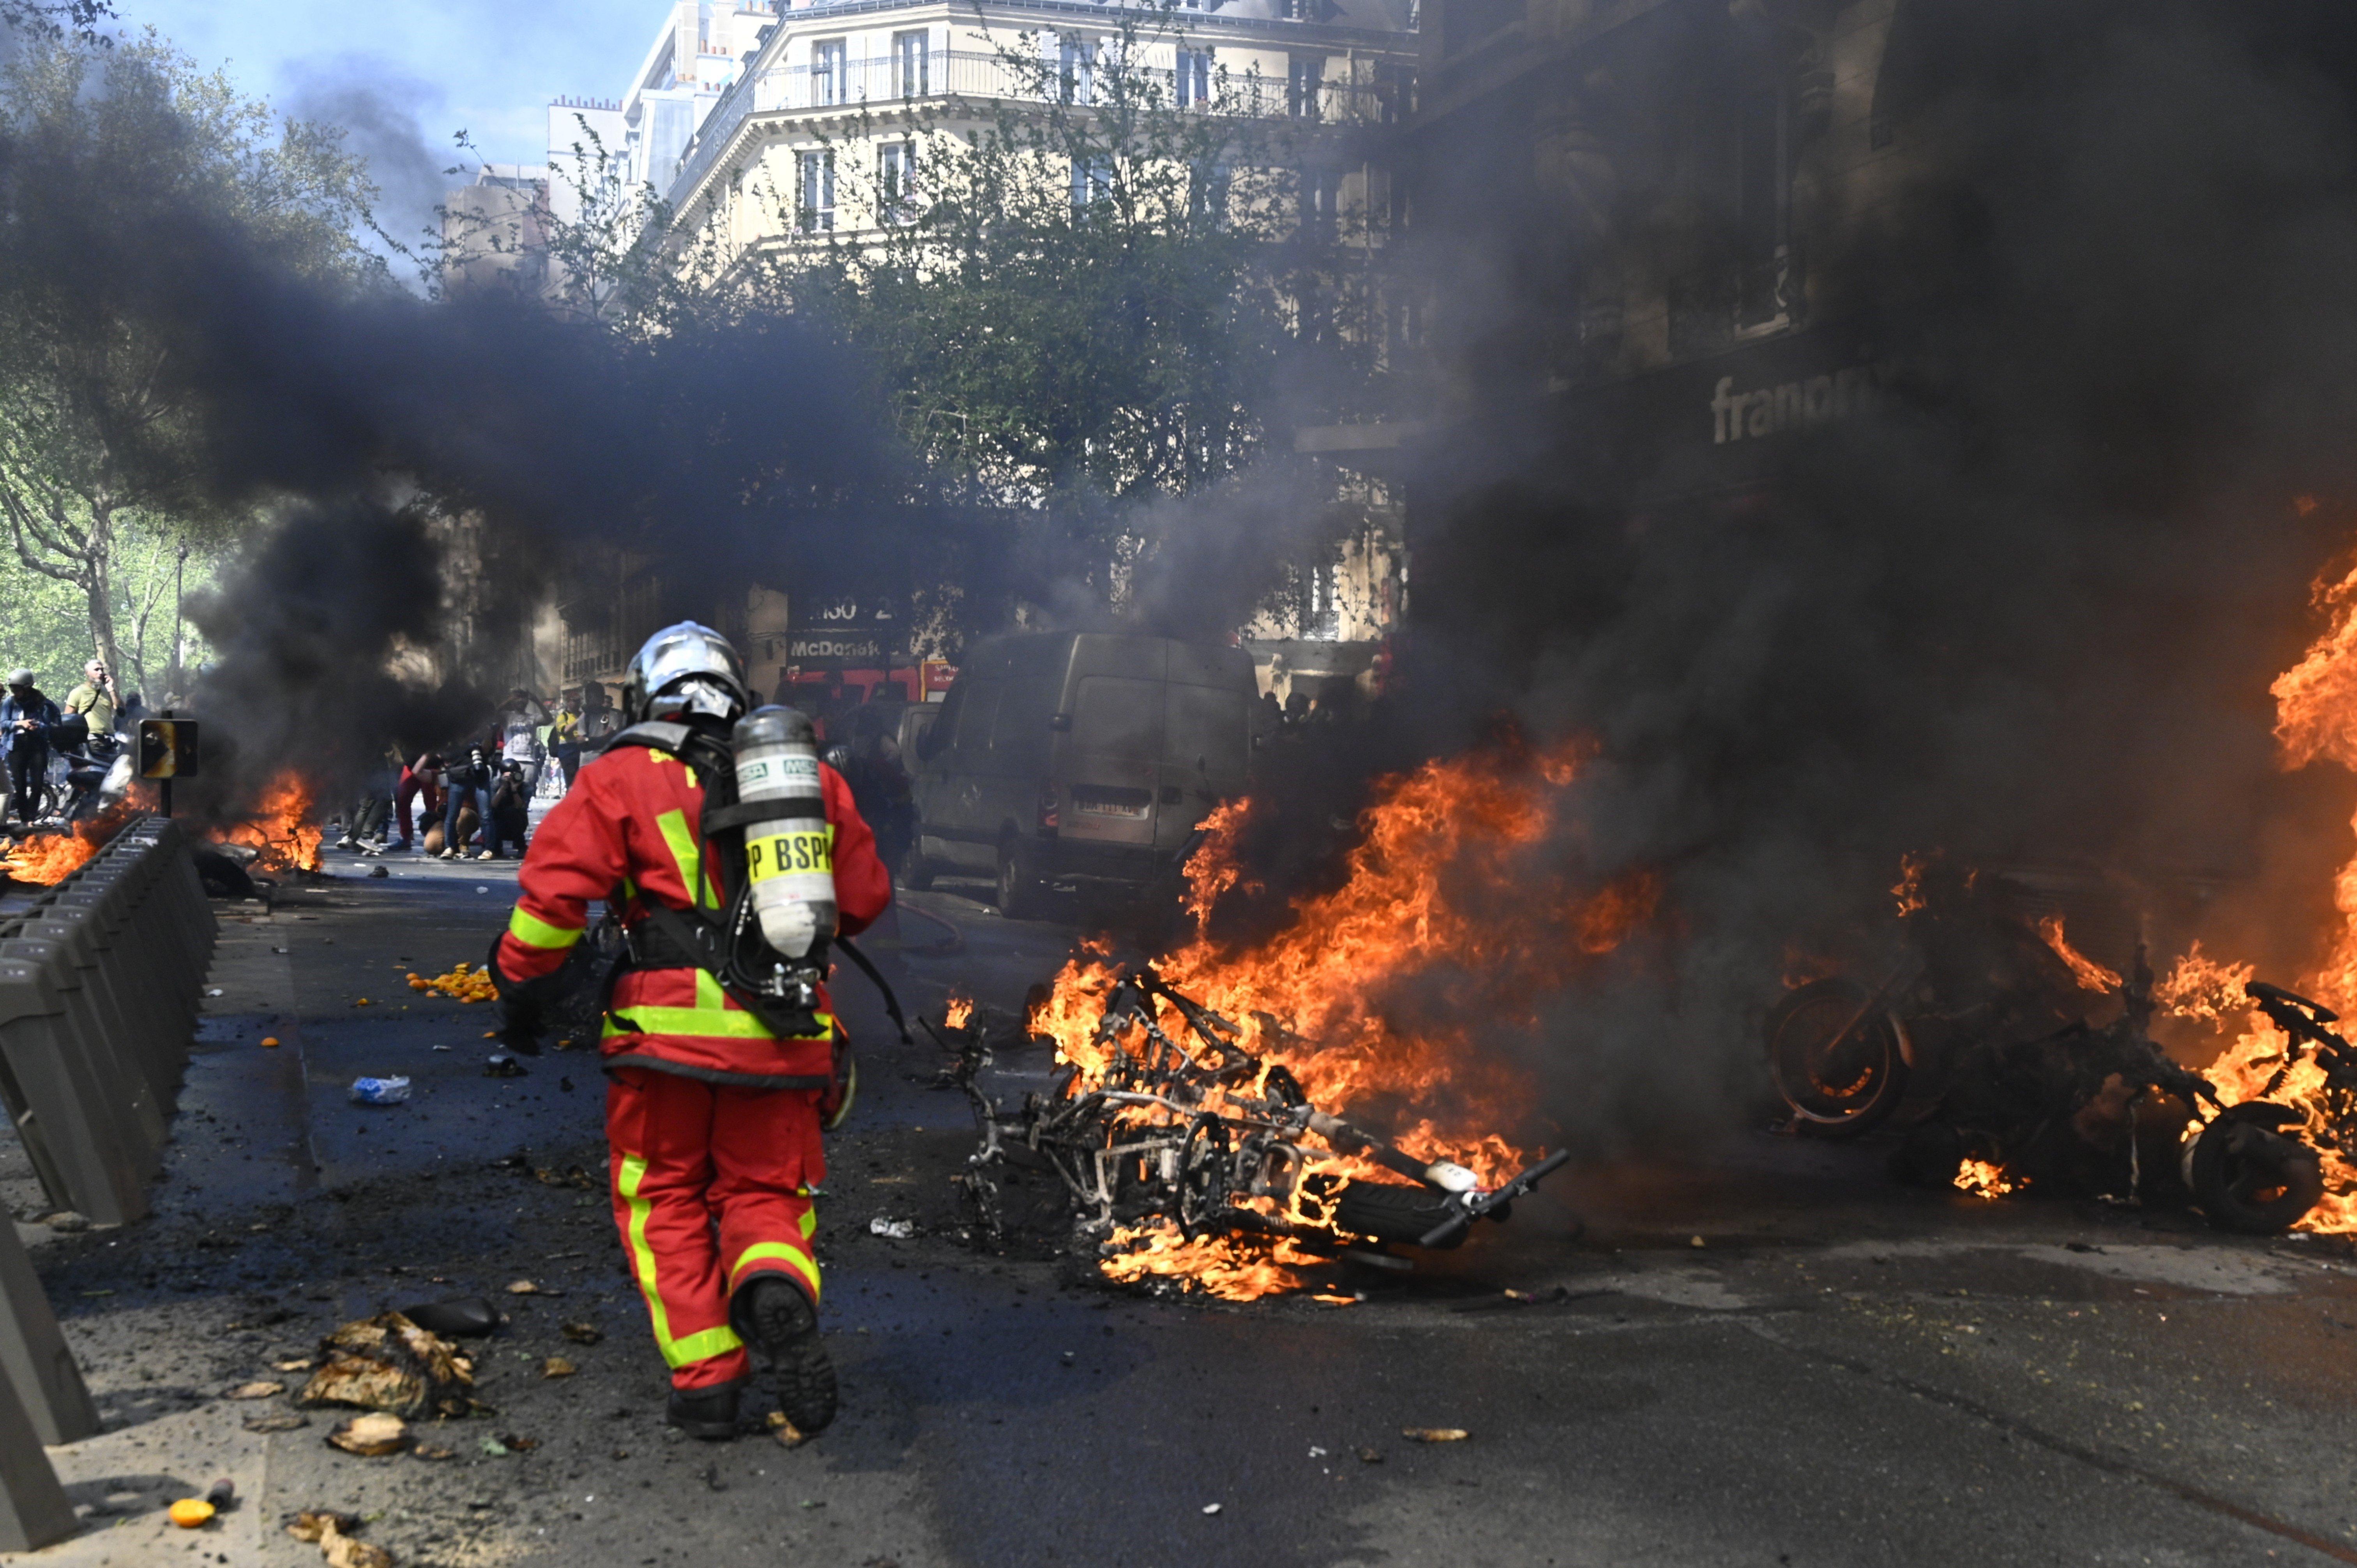 Les incendies de l'acte XXIII indignent après Notre-Dame qui a